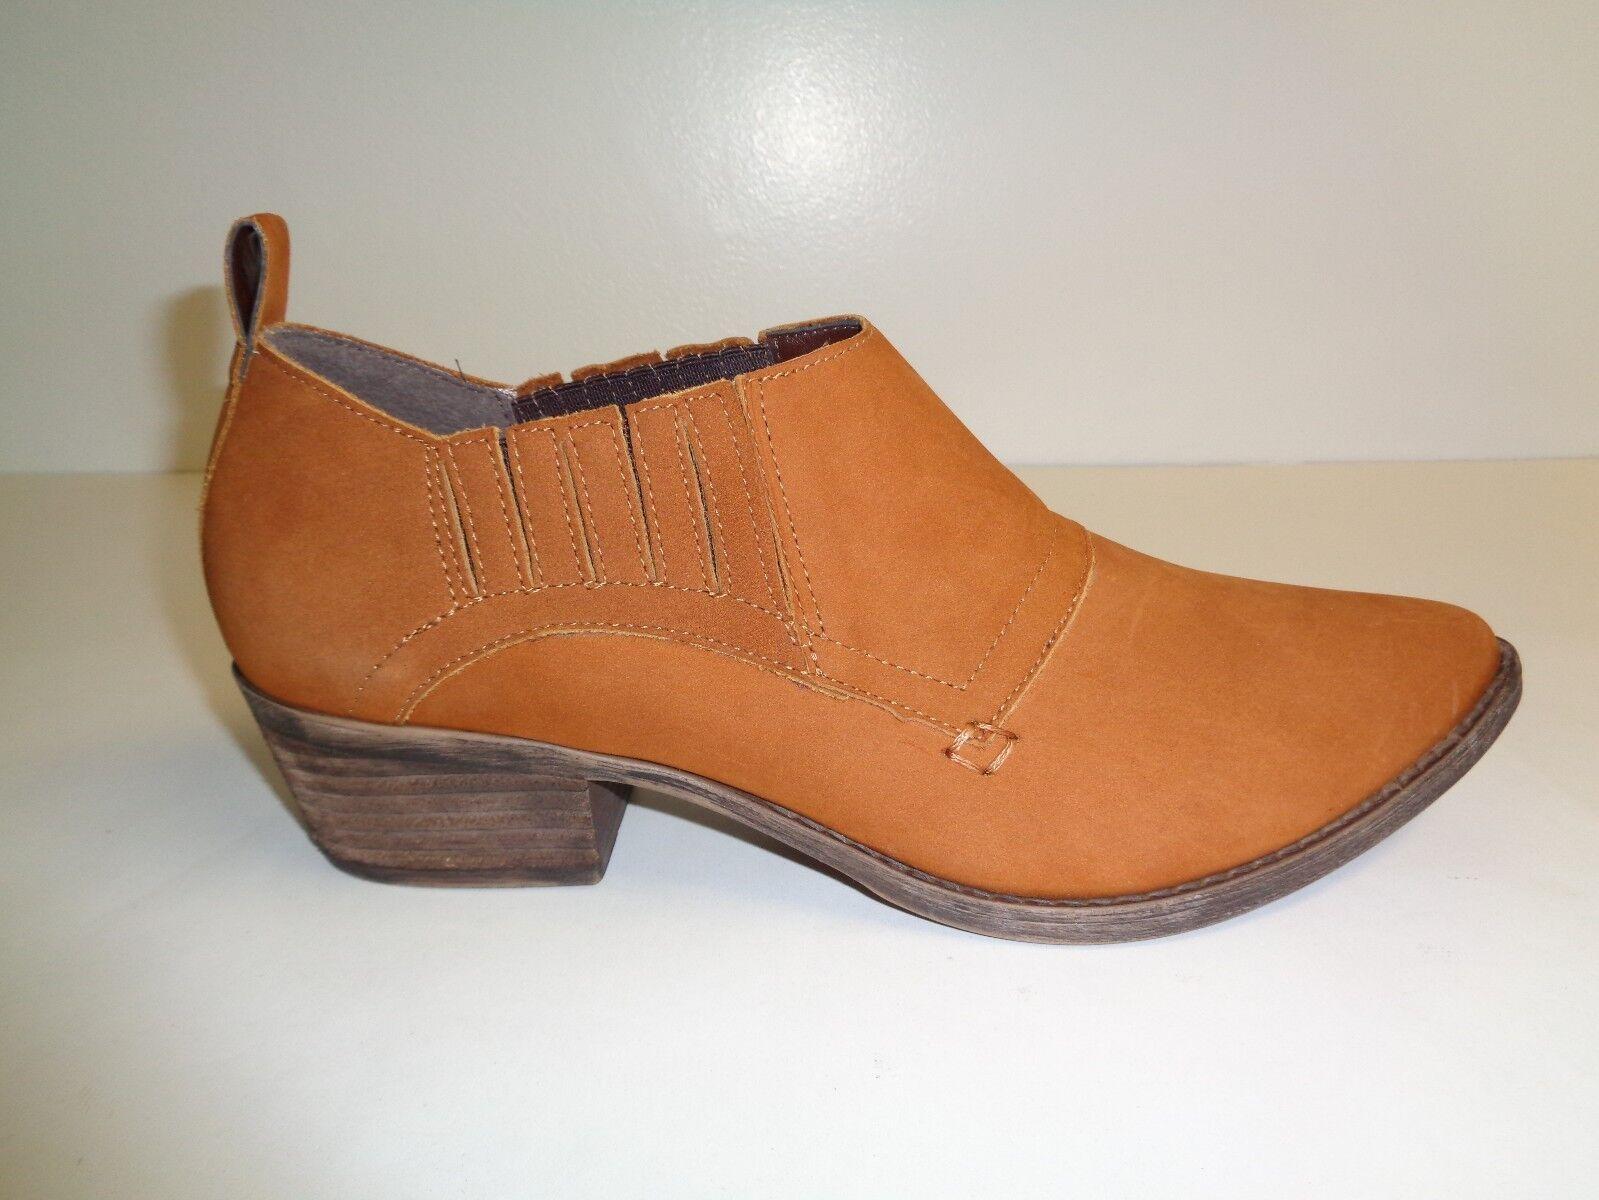 Steve Madden Größe 8 M AUCKLAND Cognac Braun Chelsea Stiefel NEU Damenschuhe Schuhes